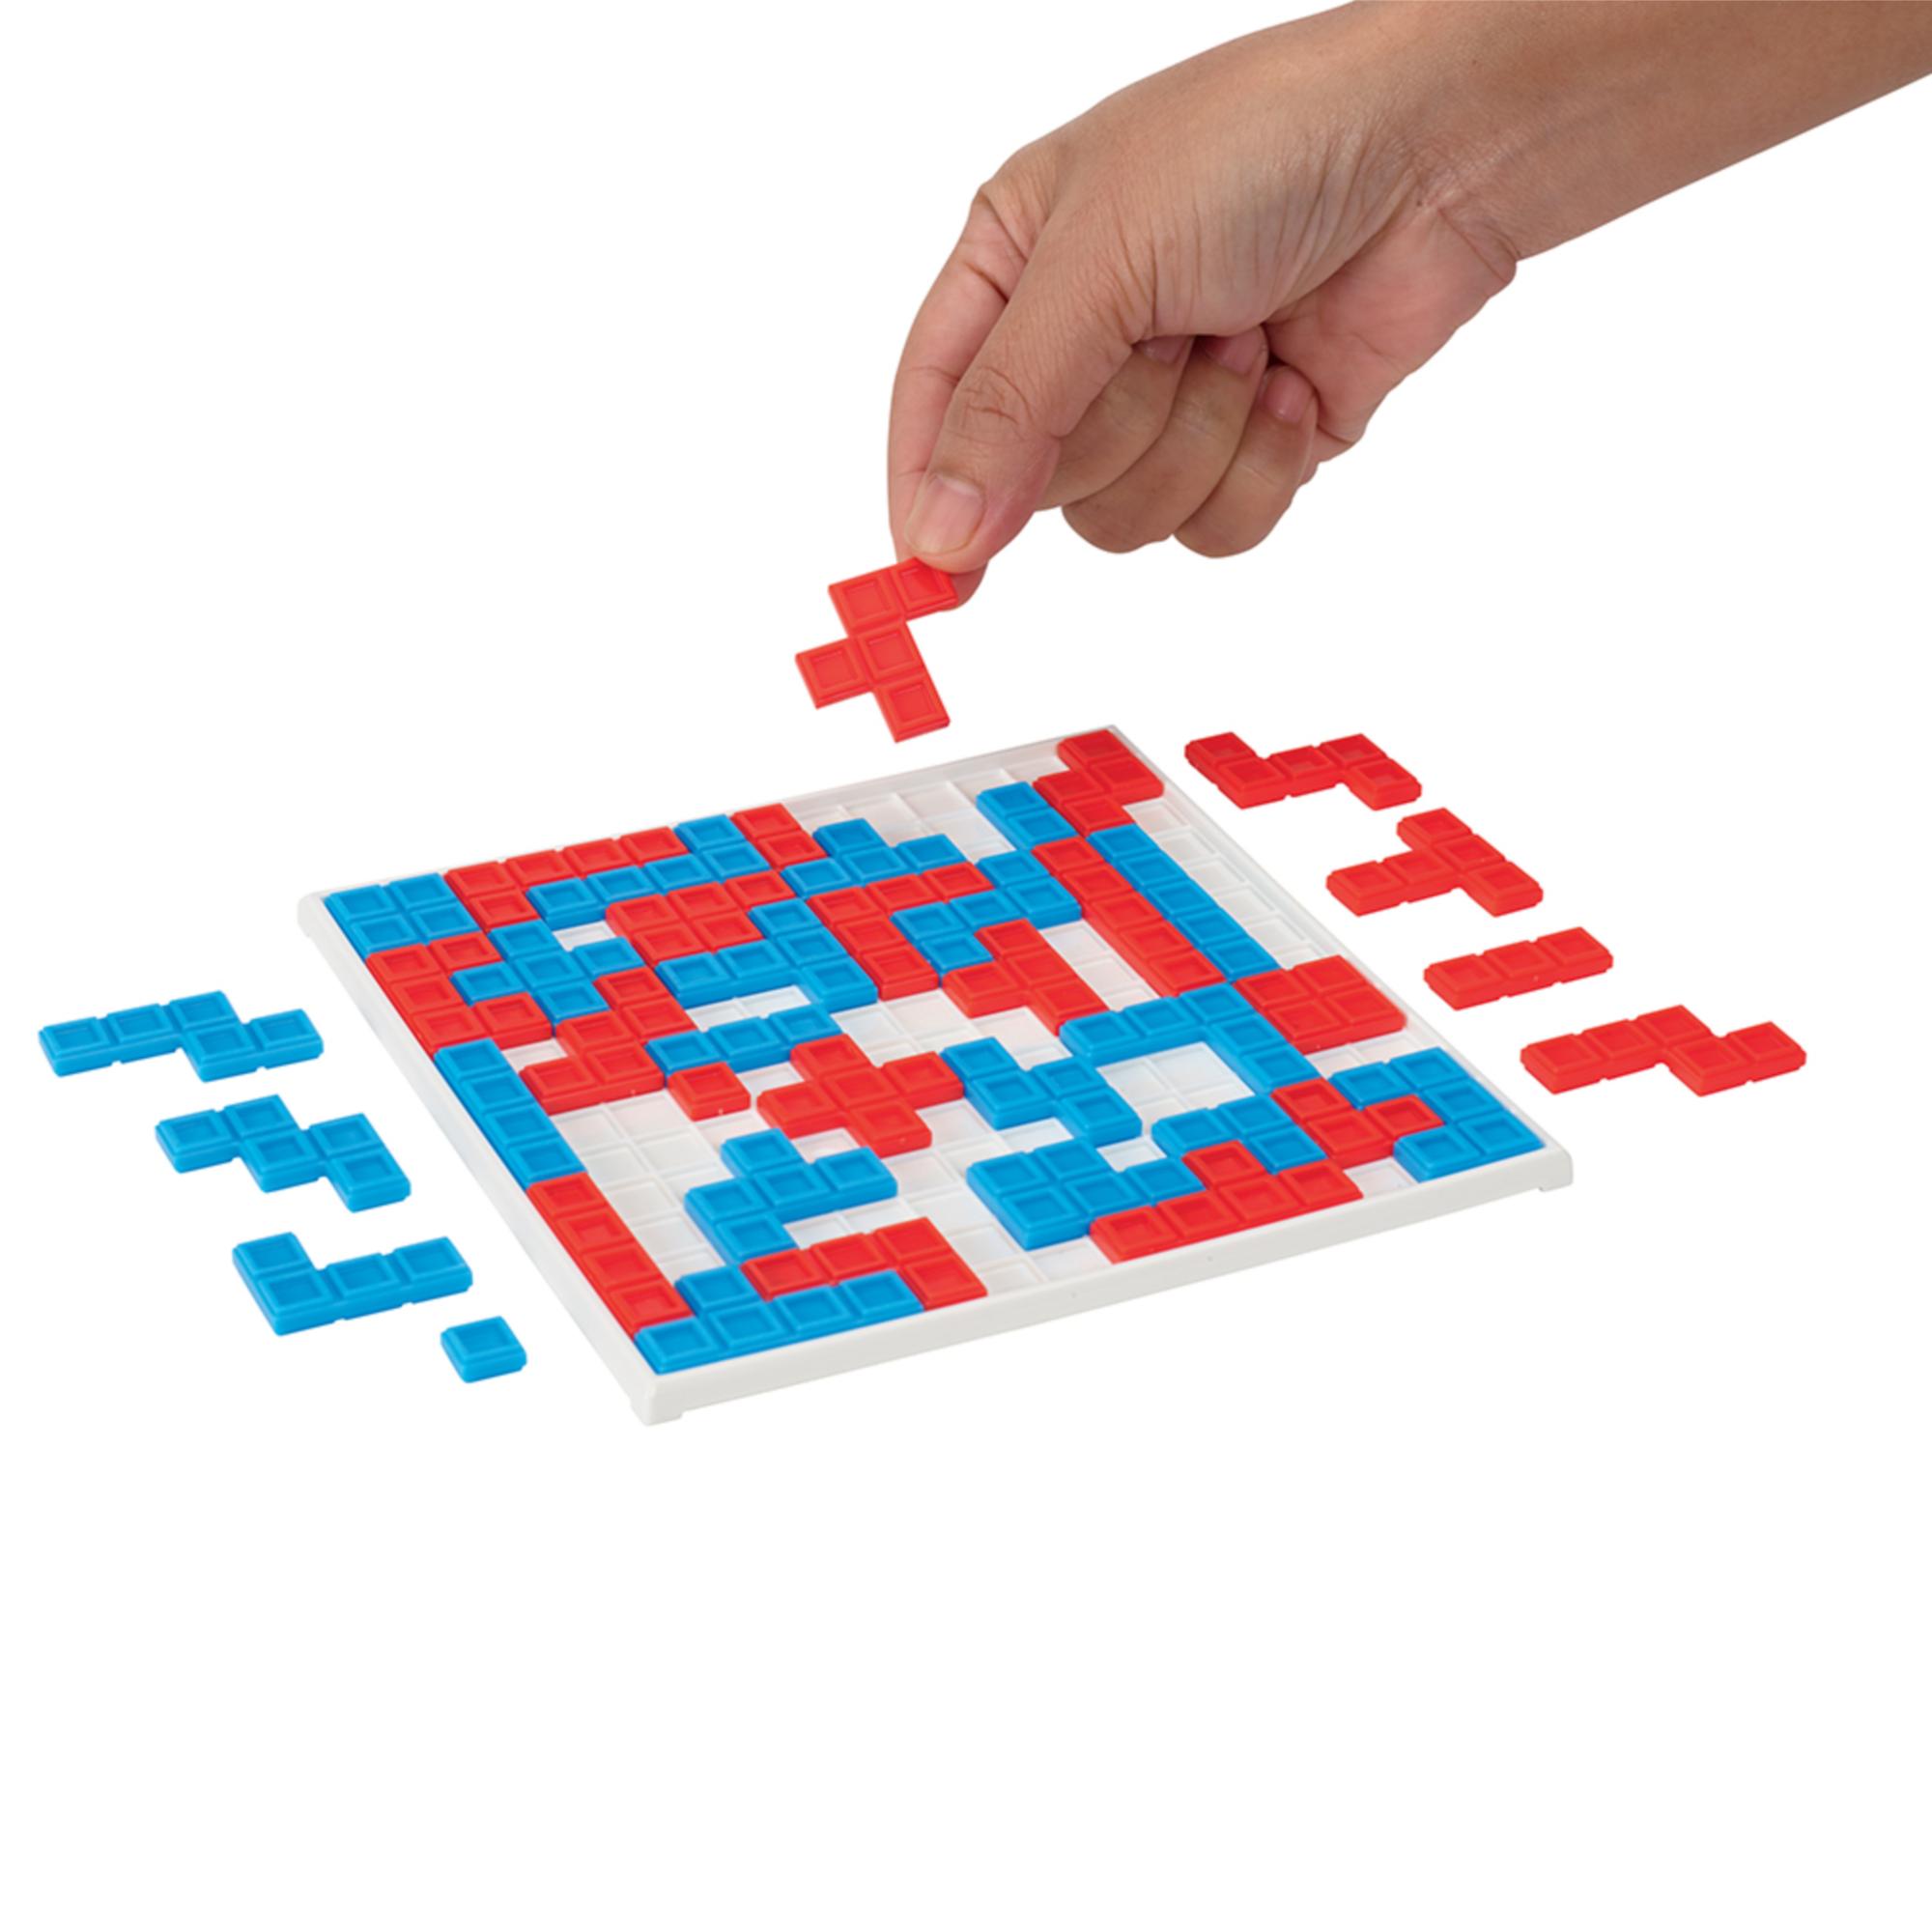 Mattel Inc. Blokus - Coll. jeu rapide